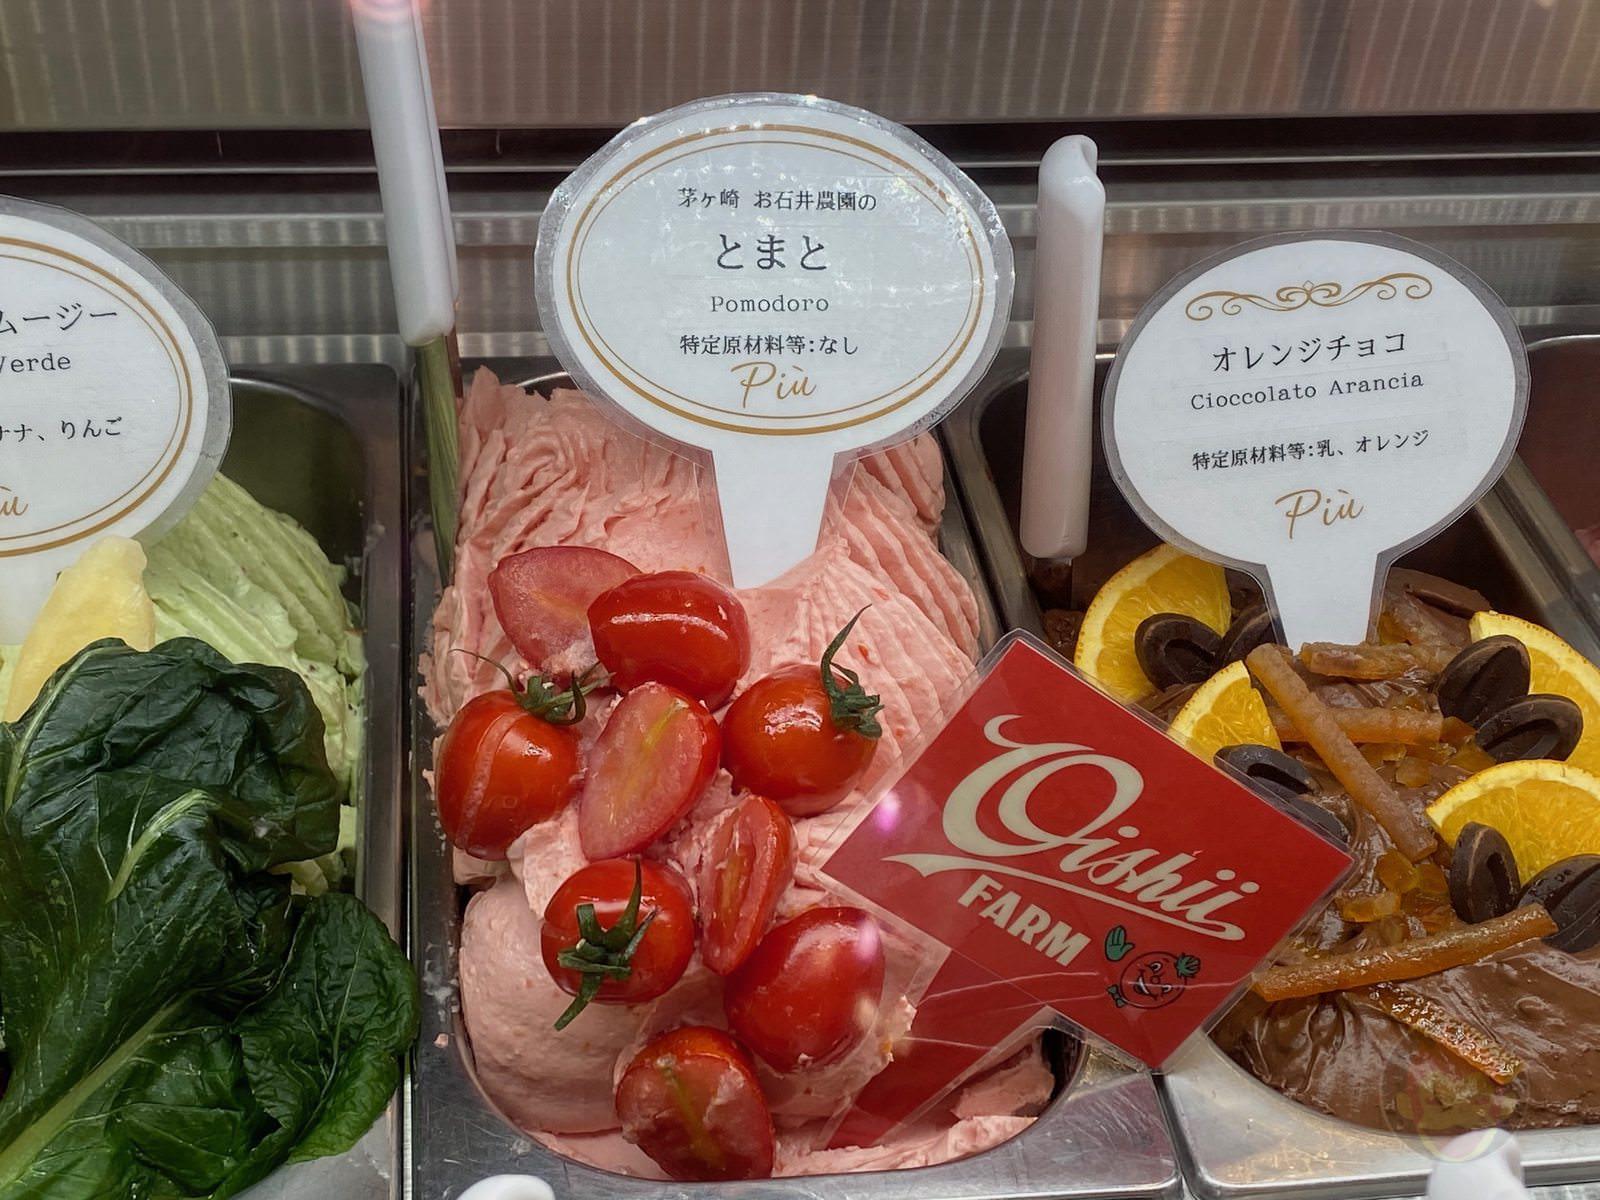 Shibuya-Scramble-Square-Food-I-Ate-104.jpeg